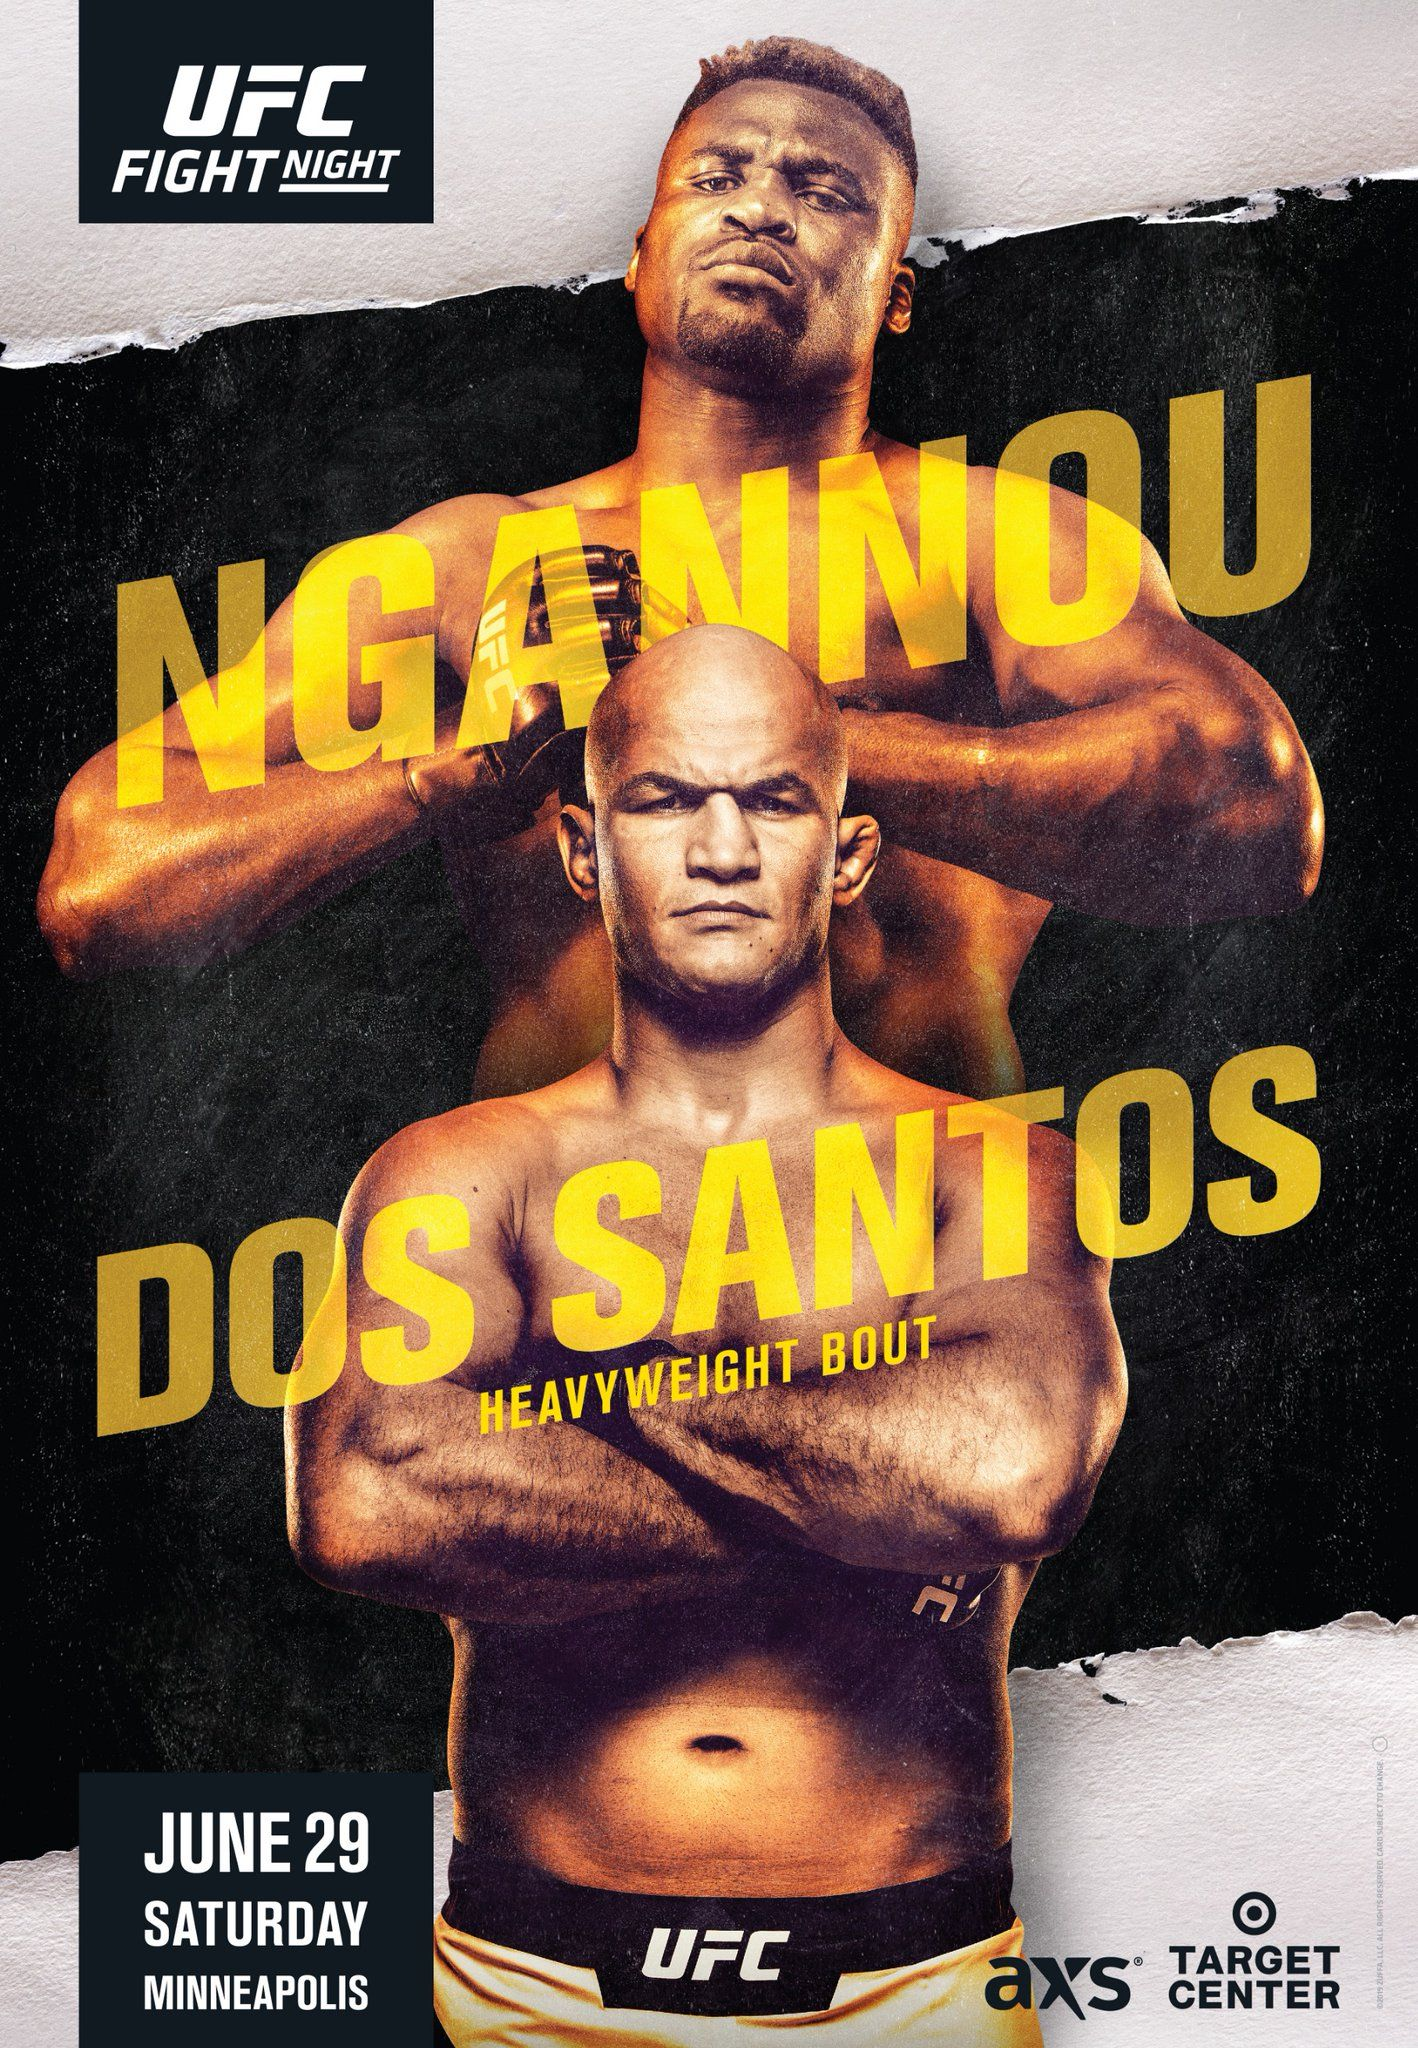 UFC ON ESPN 3 NGANNOU VS. DOS SANTOS UFCMINNEAPOLIS